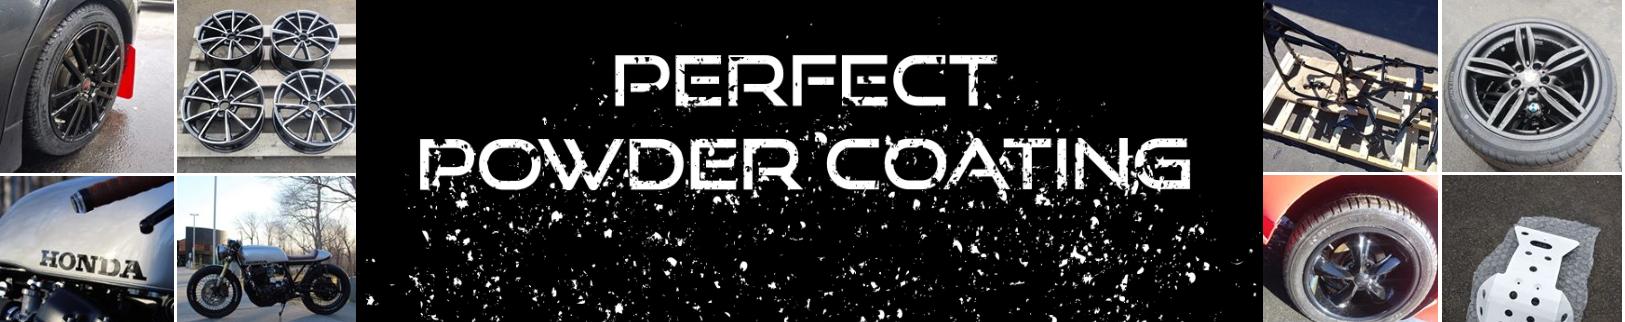 perfect powder coating